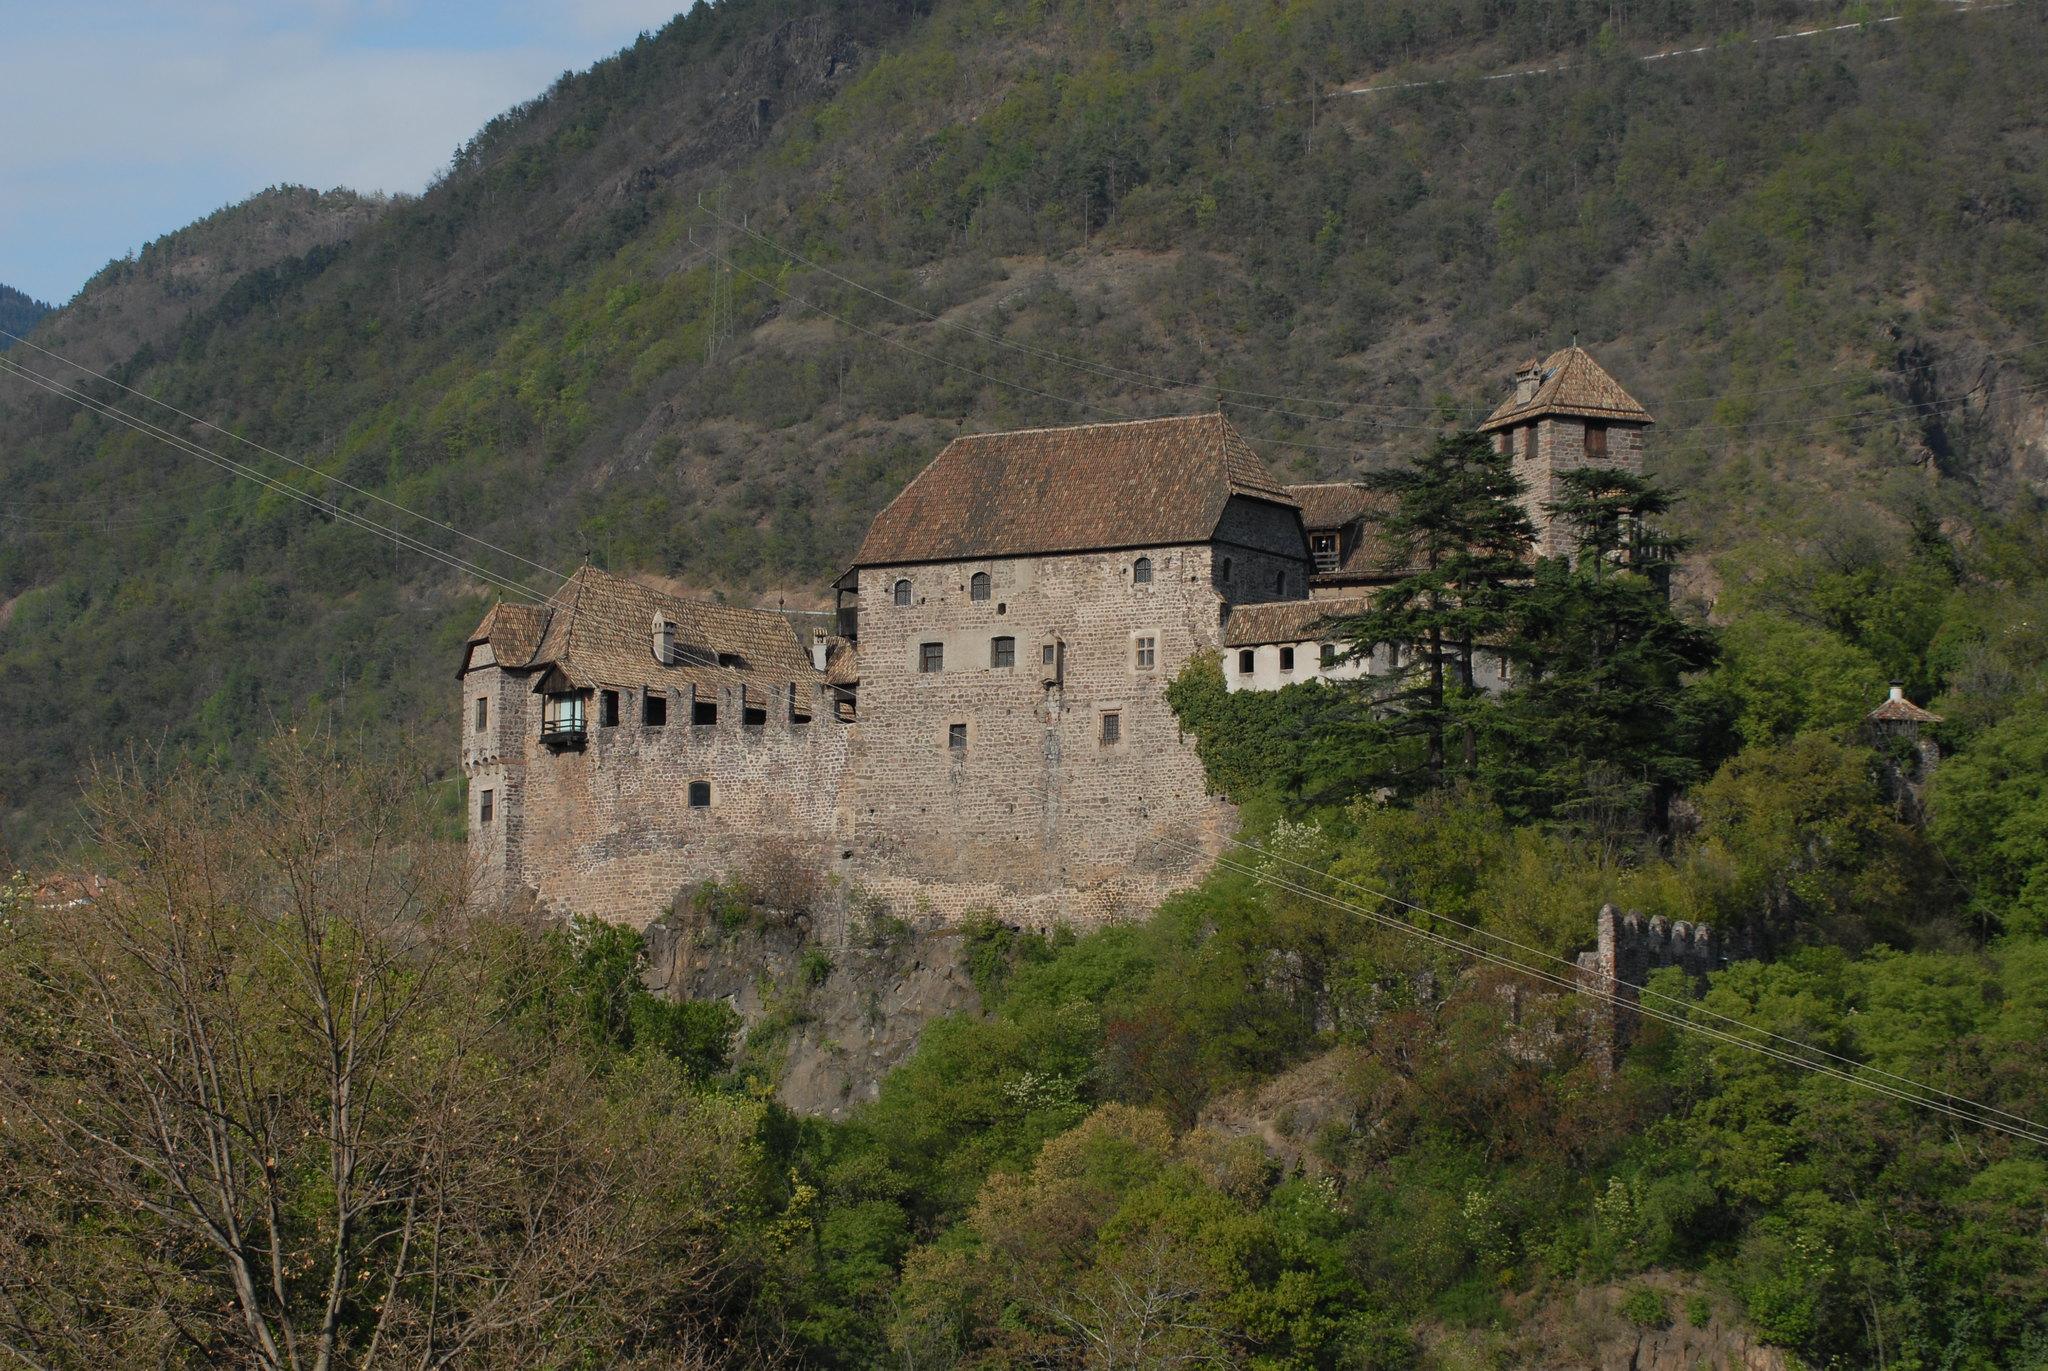 castel roncolo storia